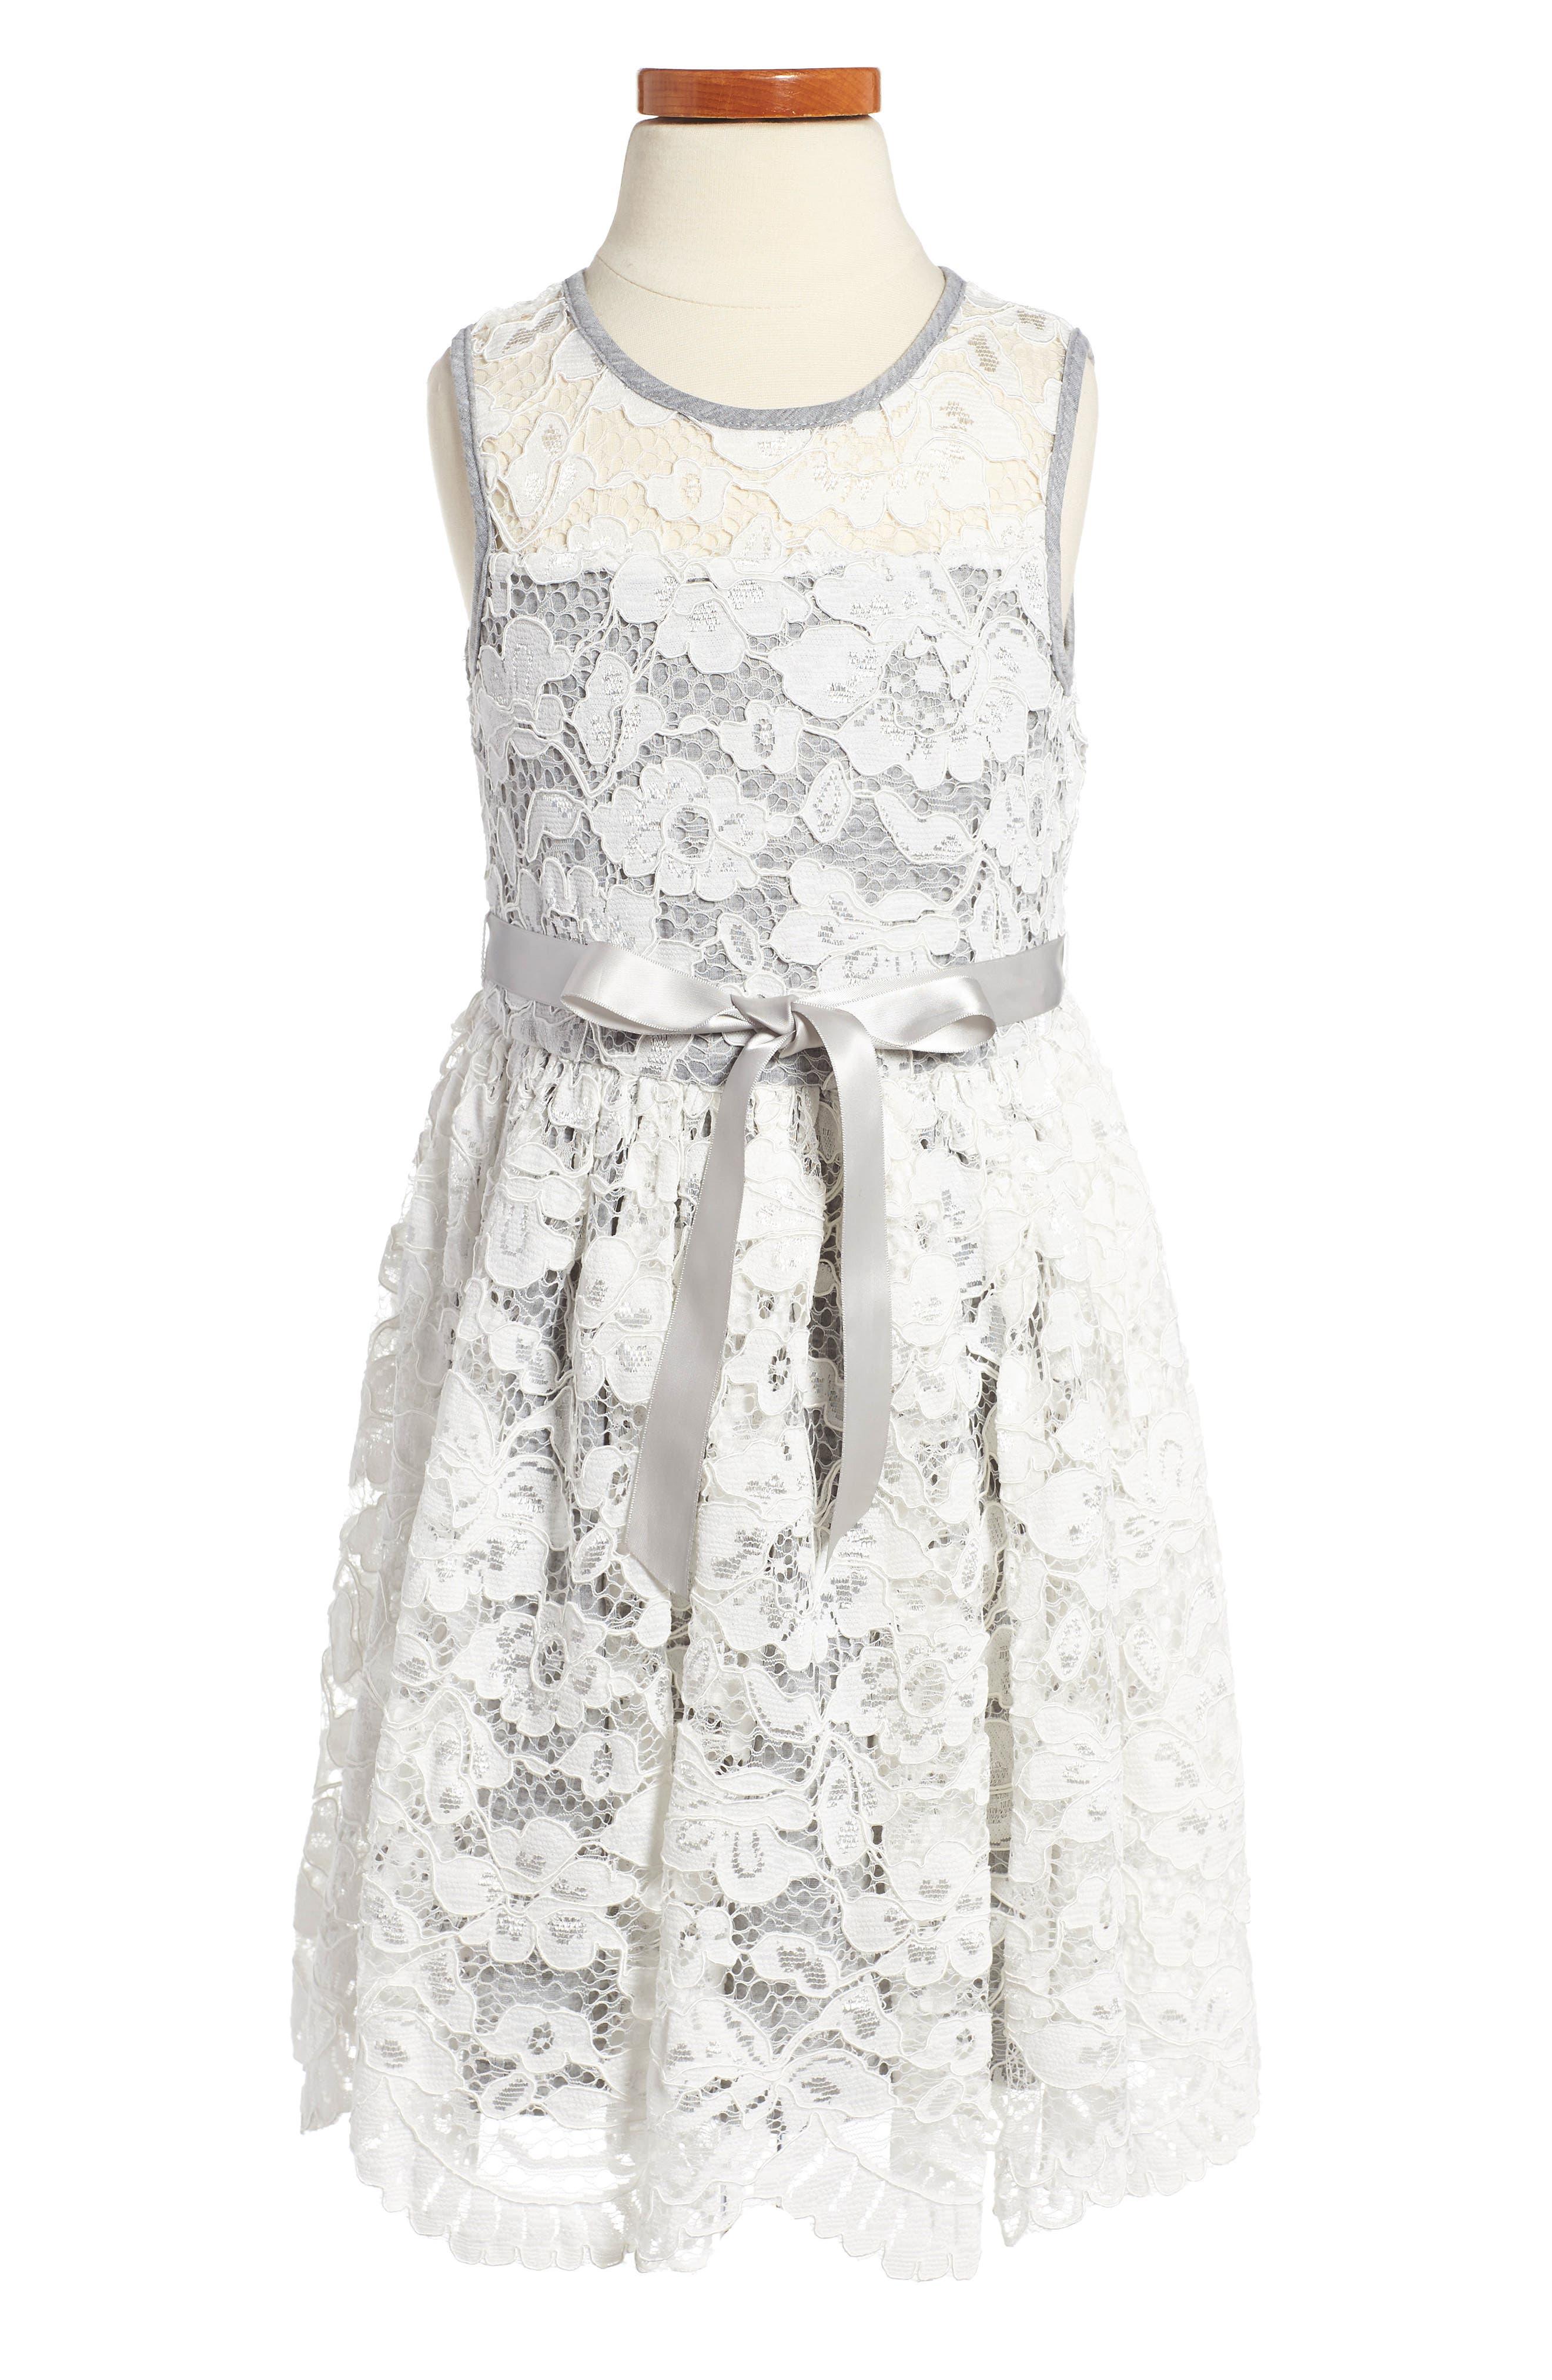 Main Image - Zunie Scalloped Floral Lace Dress (Toddler Girls, Little Girls & Big Girls)